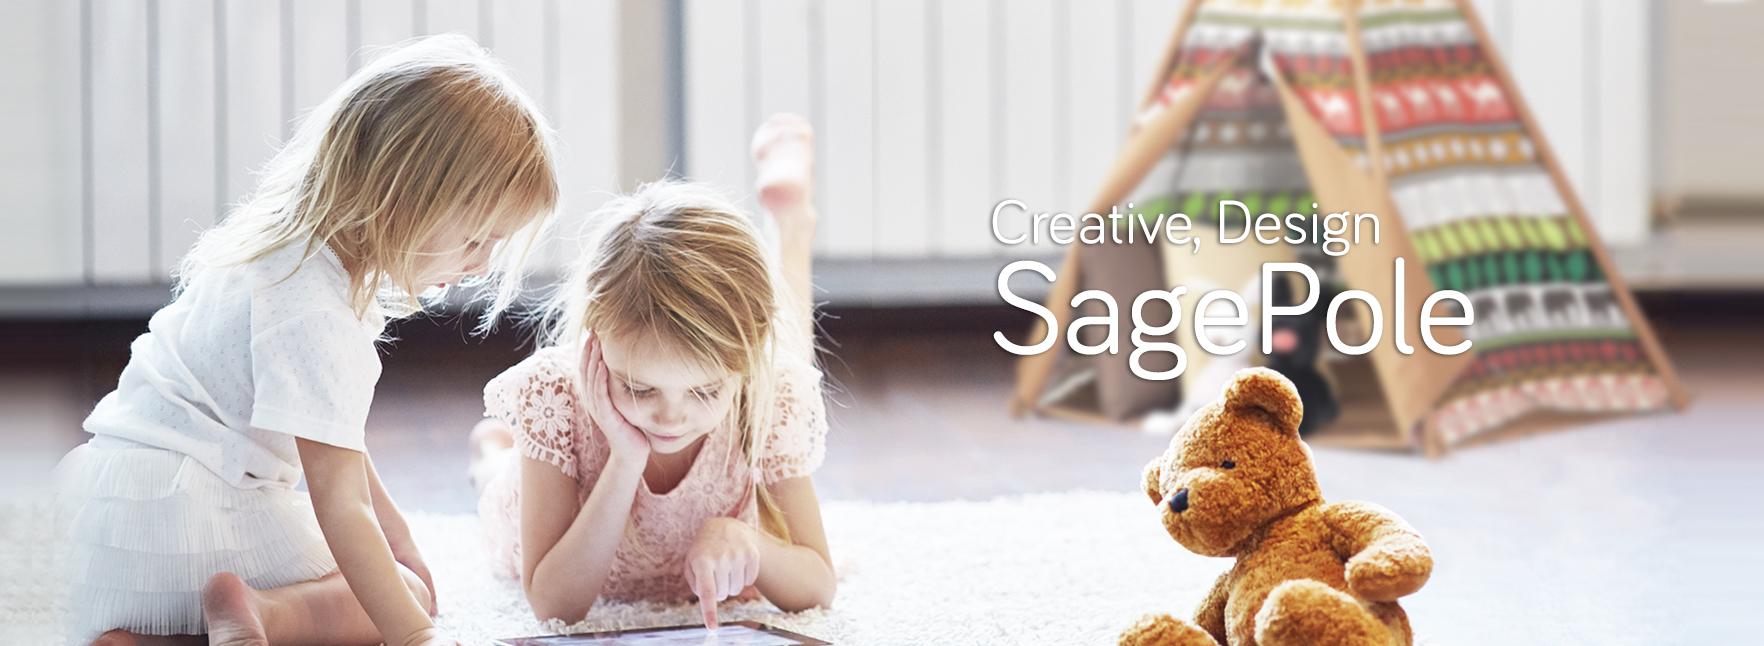 sagepole-brand-image.jpg